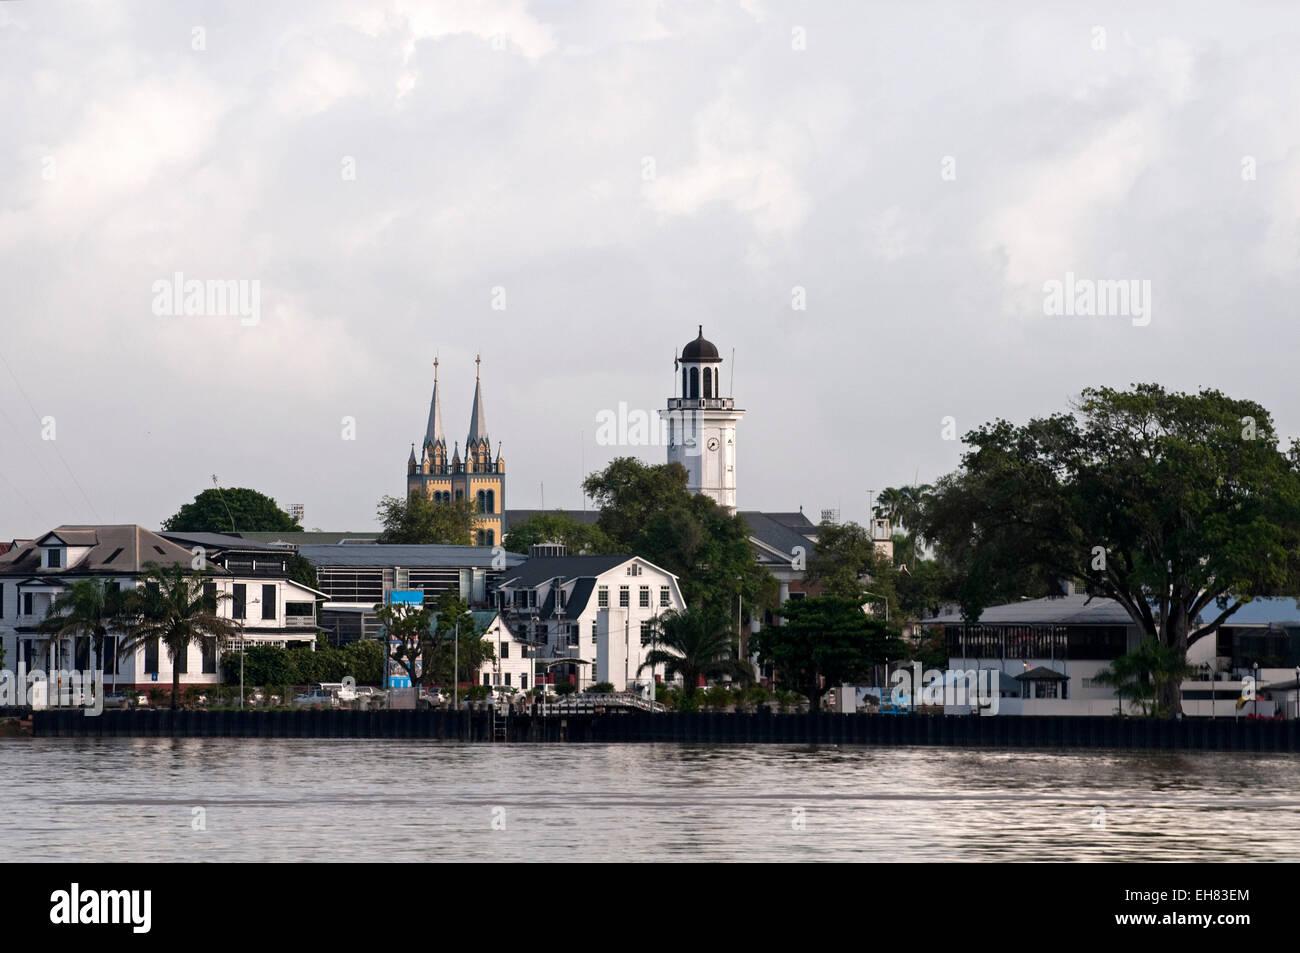 View of Paramaribo from the river, Paramaribo, Suriname, South America - Stock Image